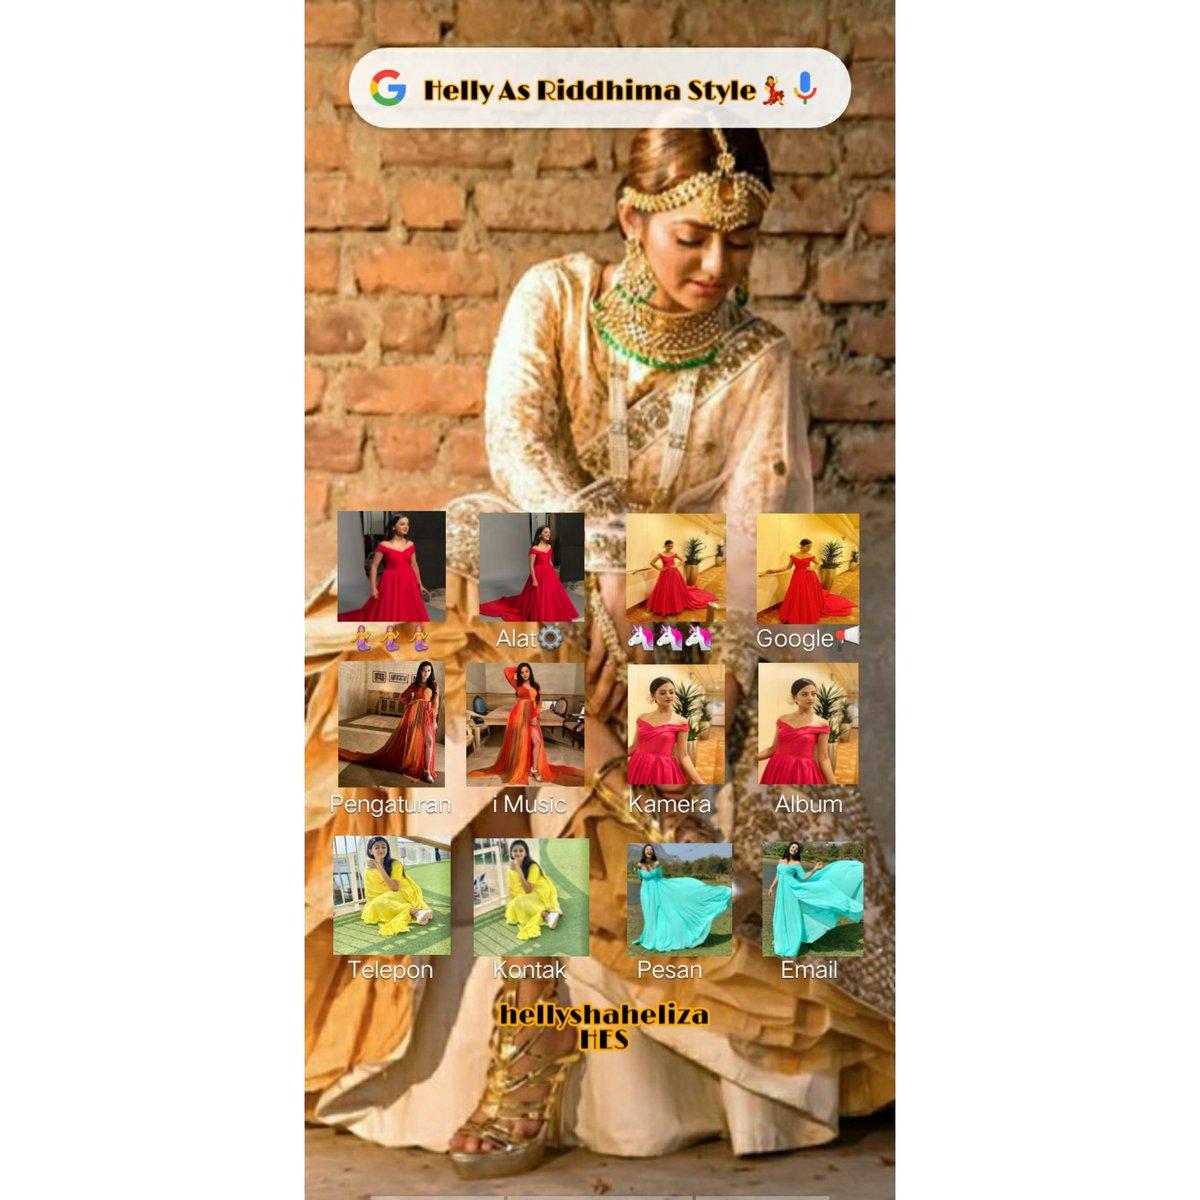 Helly As Riddhima Style💃 @OfficialHelly7  #HellyShah #ishqmeinmarjawan2 #IMMJ2 #immj #colorstv #hellyasriddhima #riddhima https://t.co/FU4ieyQr6x